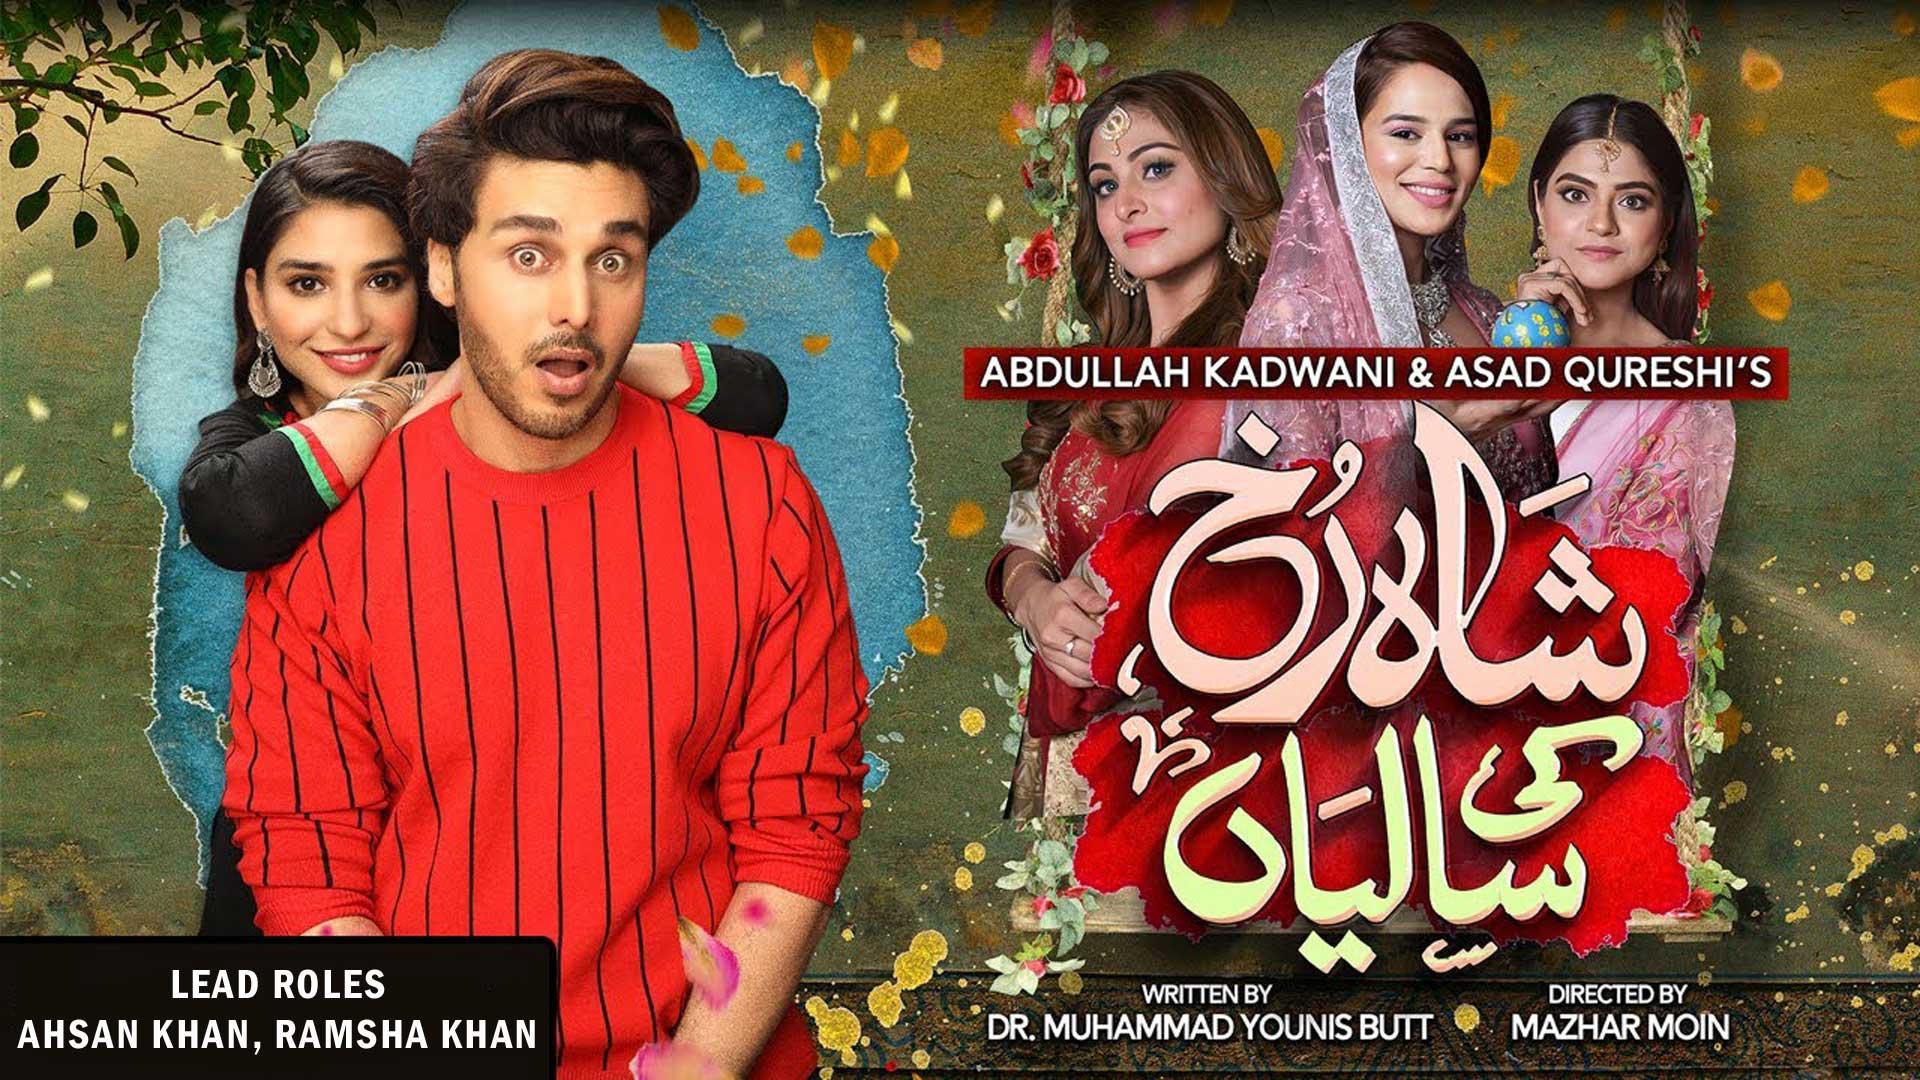 Shahrukh Ki Saaliyan Episode 8